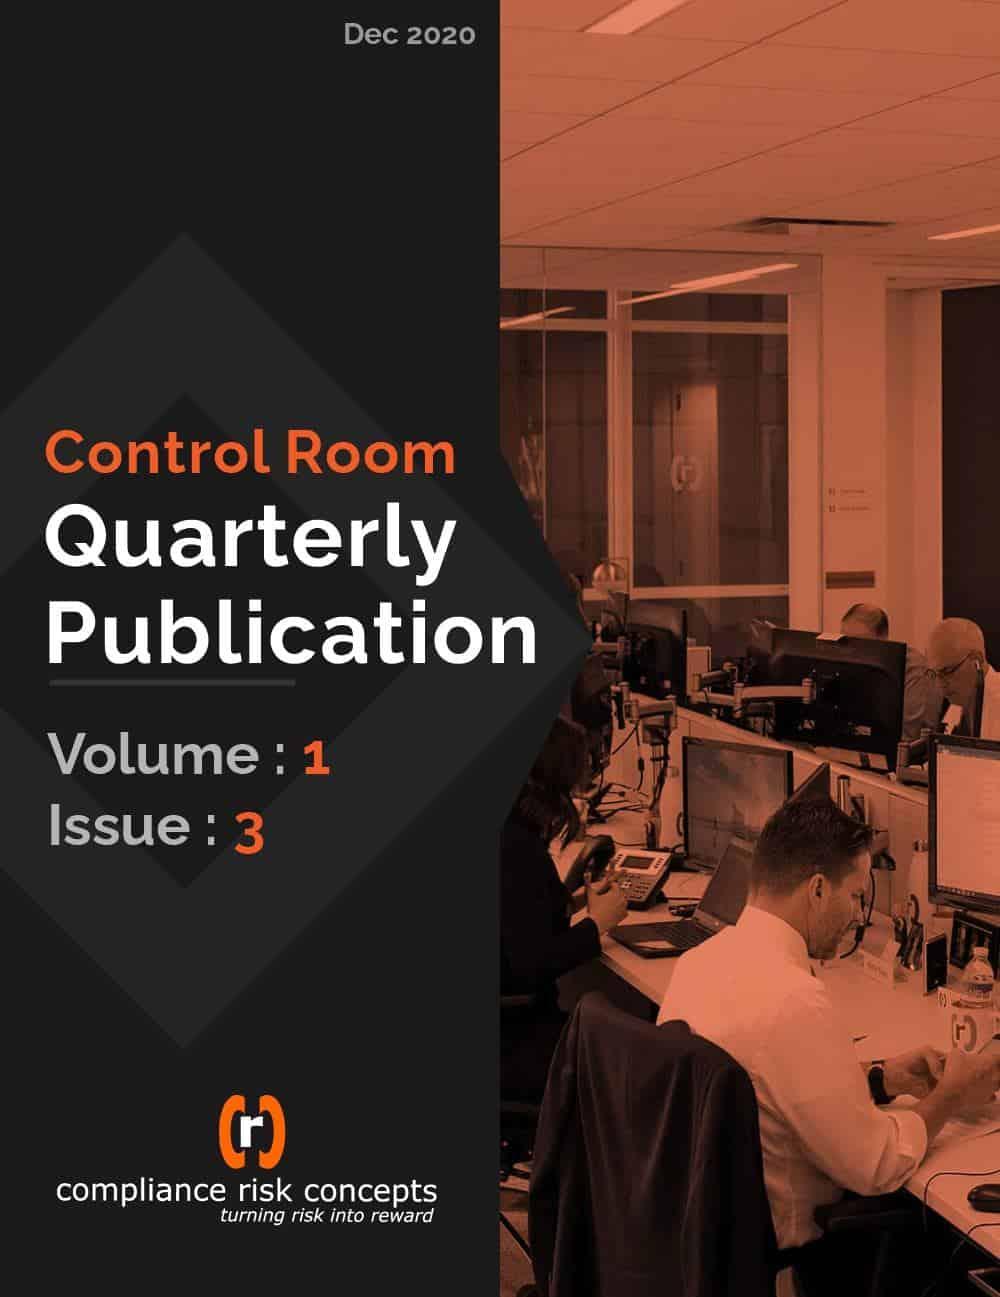 controlroom-publication-vol-1-issue-3-1 (1)